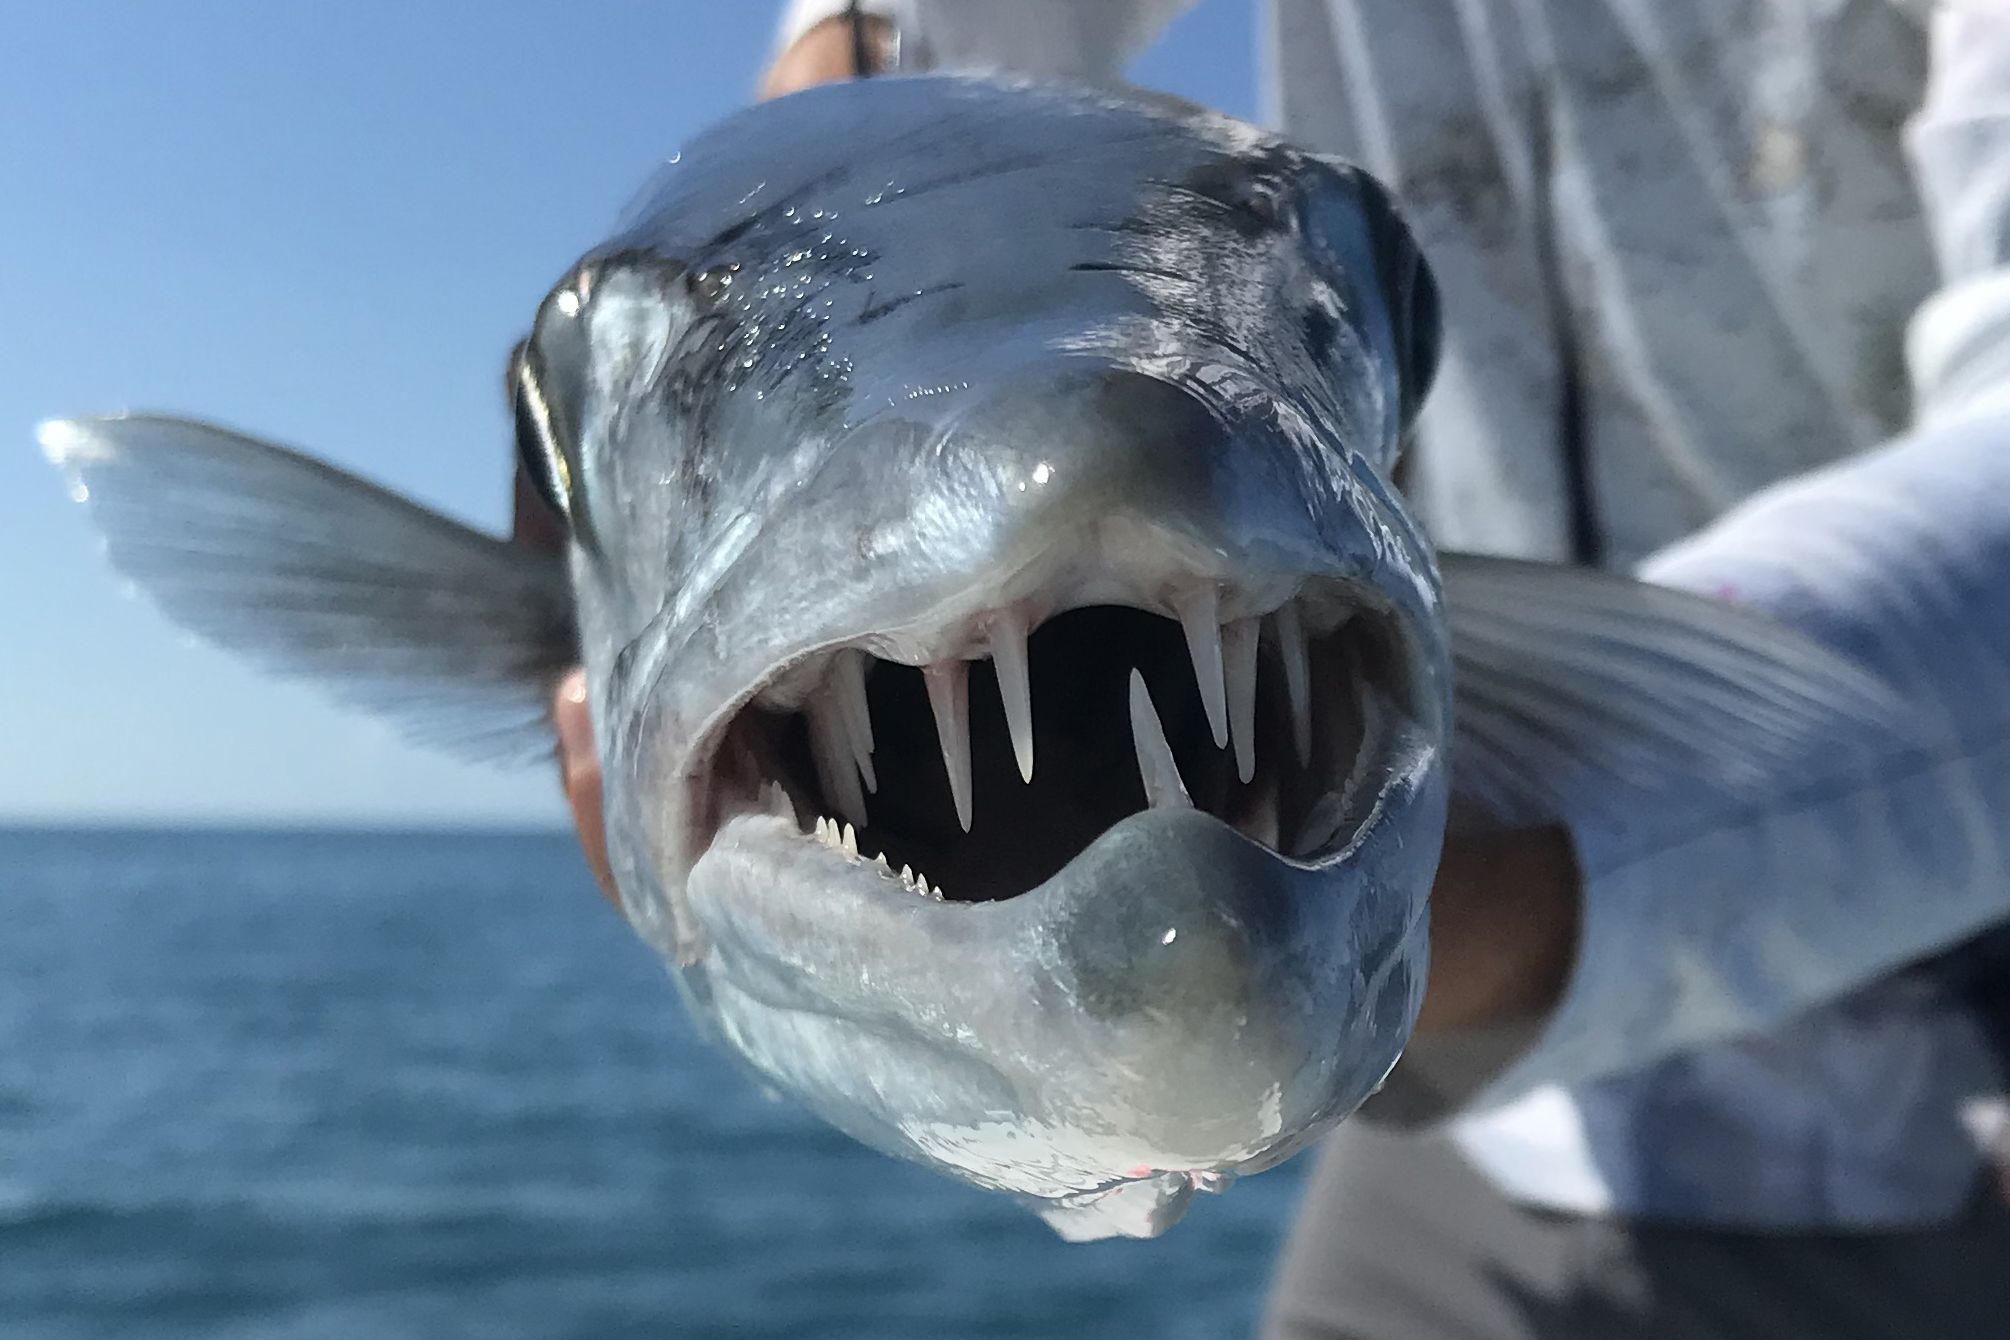 A Barracuda fish facing the camera